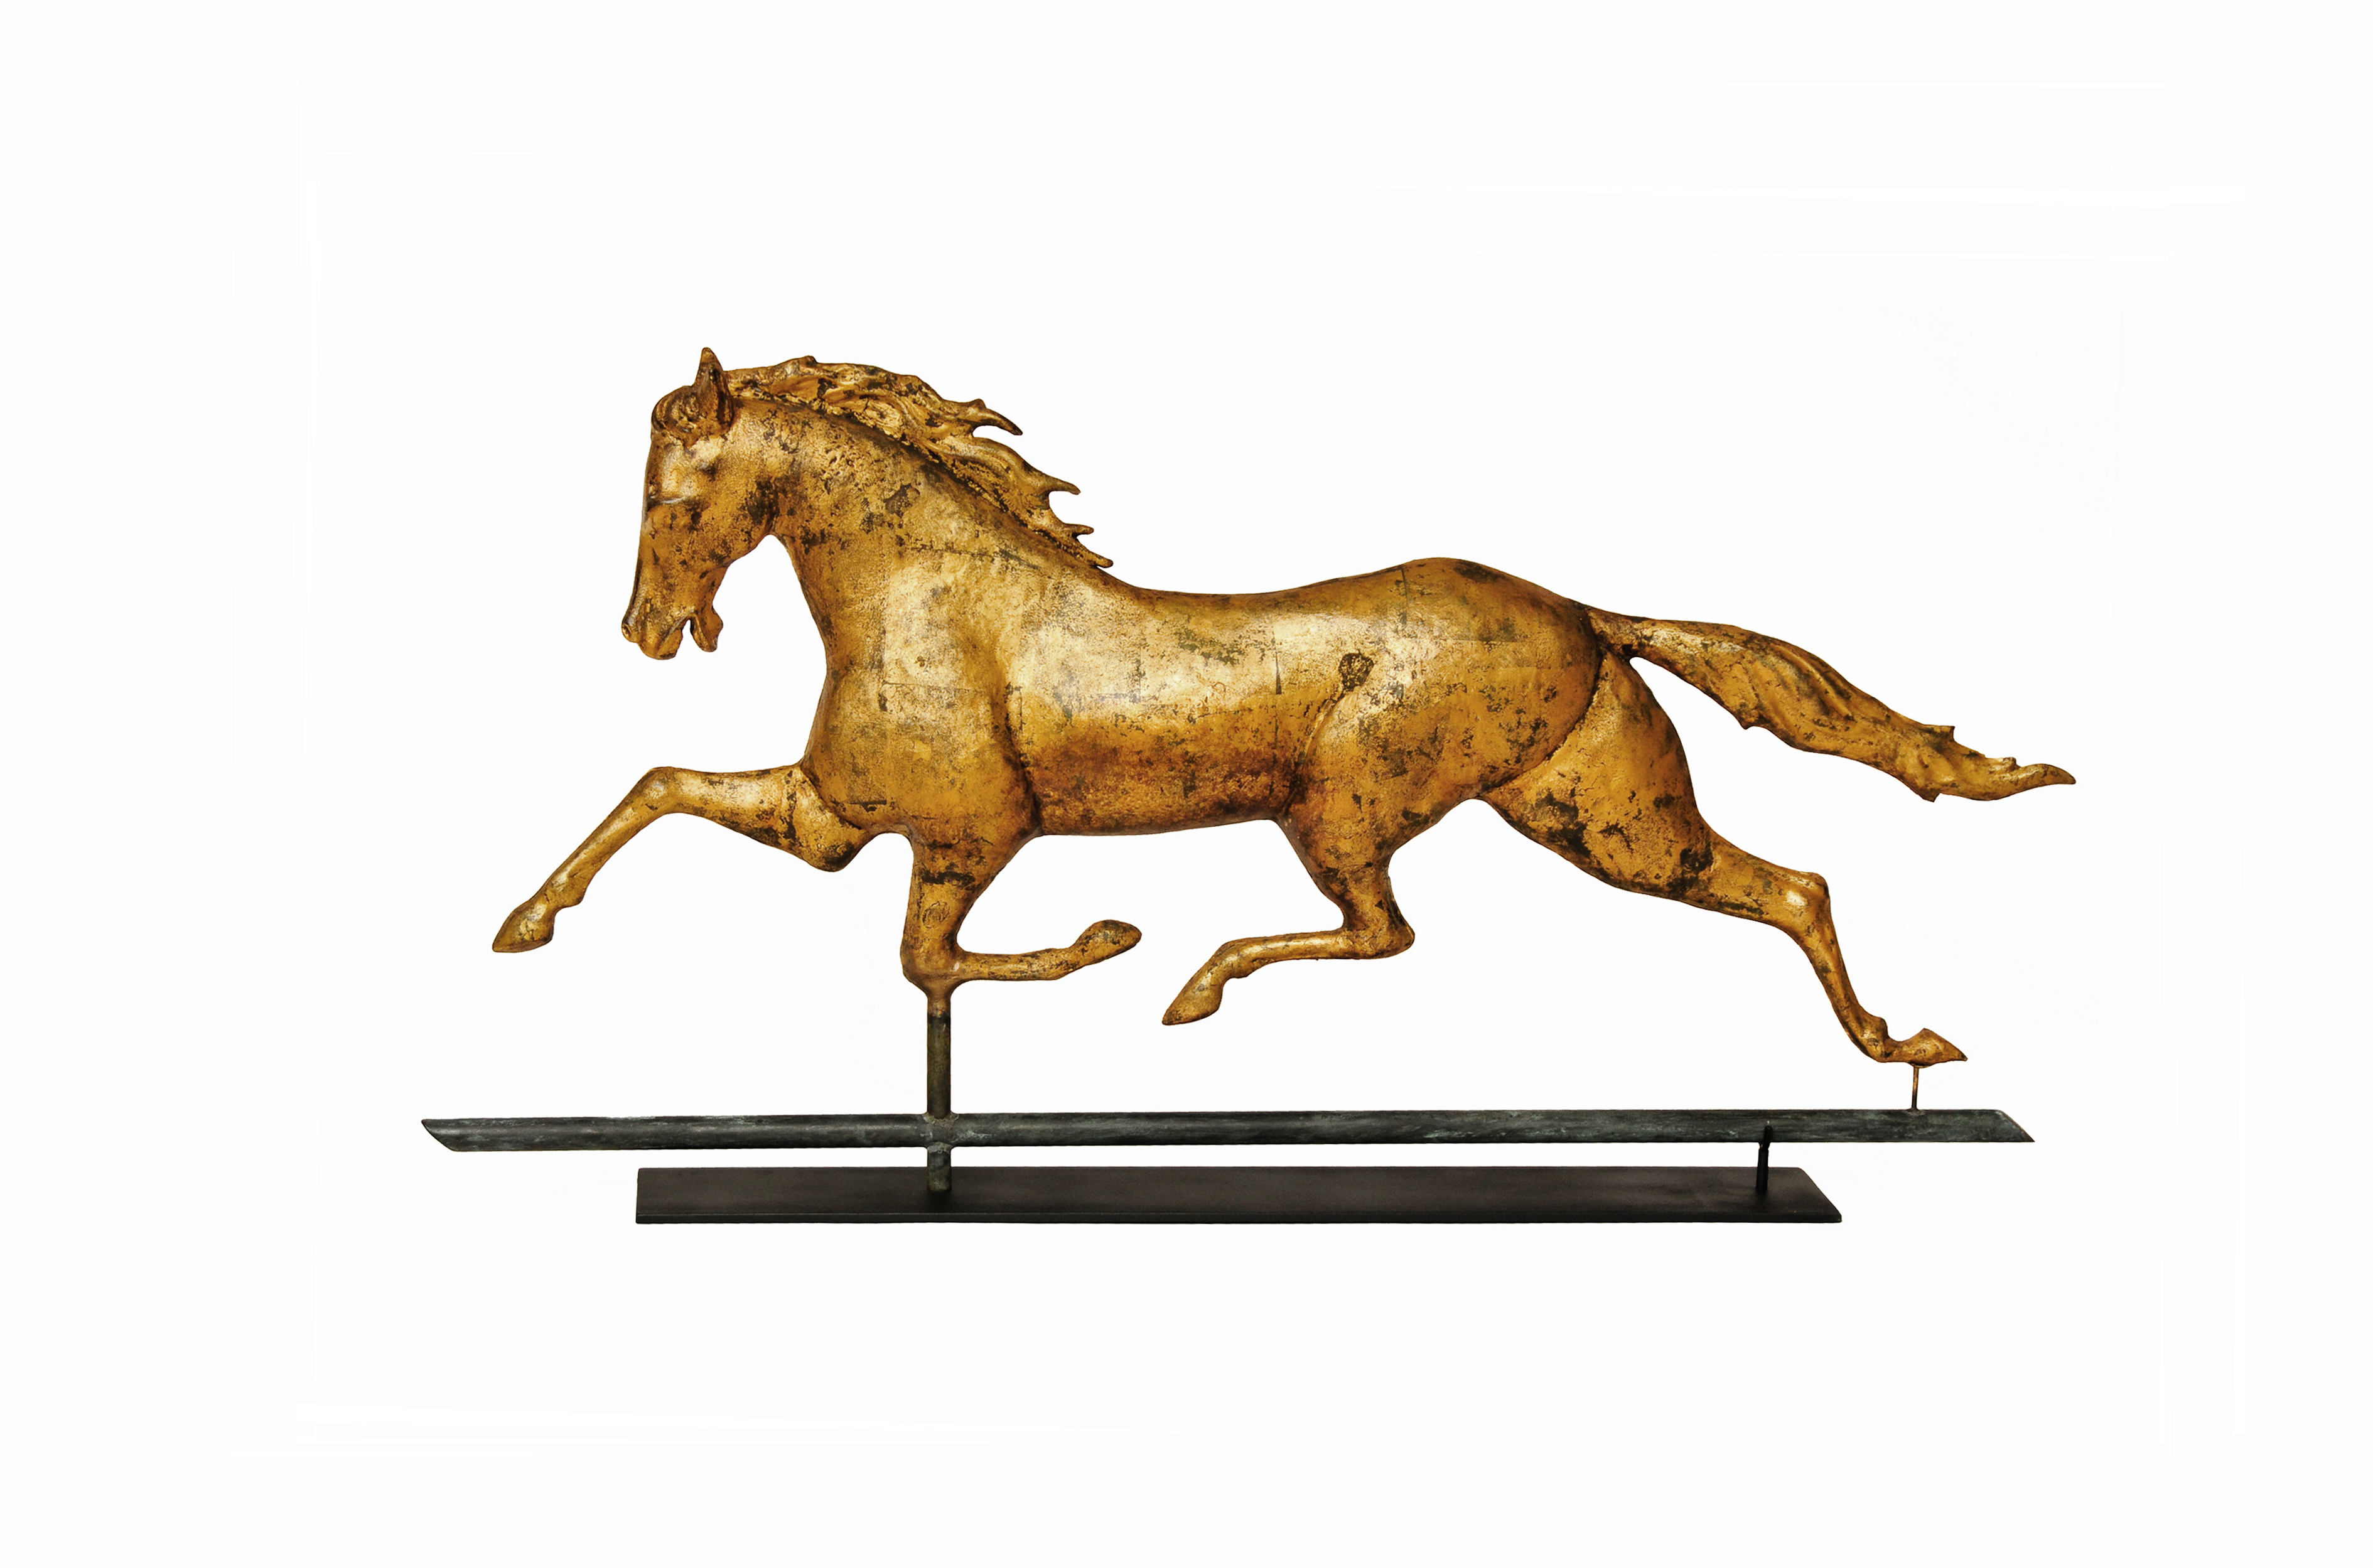 Copper And Zinc Patchen Horse Weathervane Sold